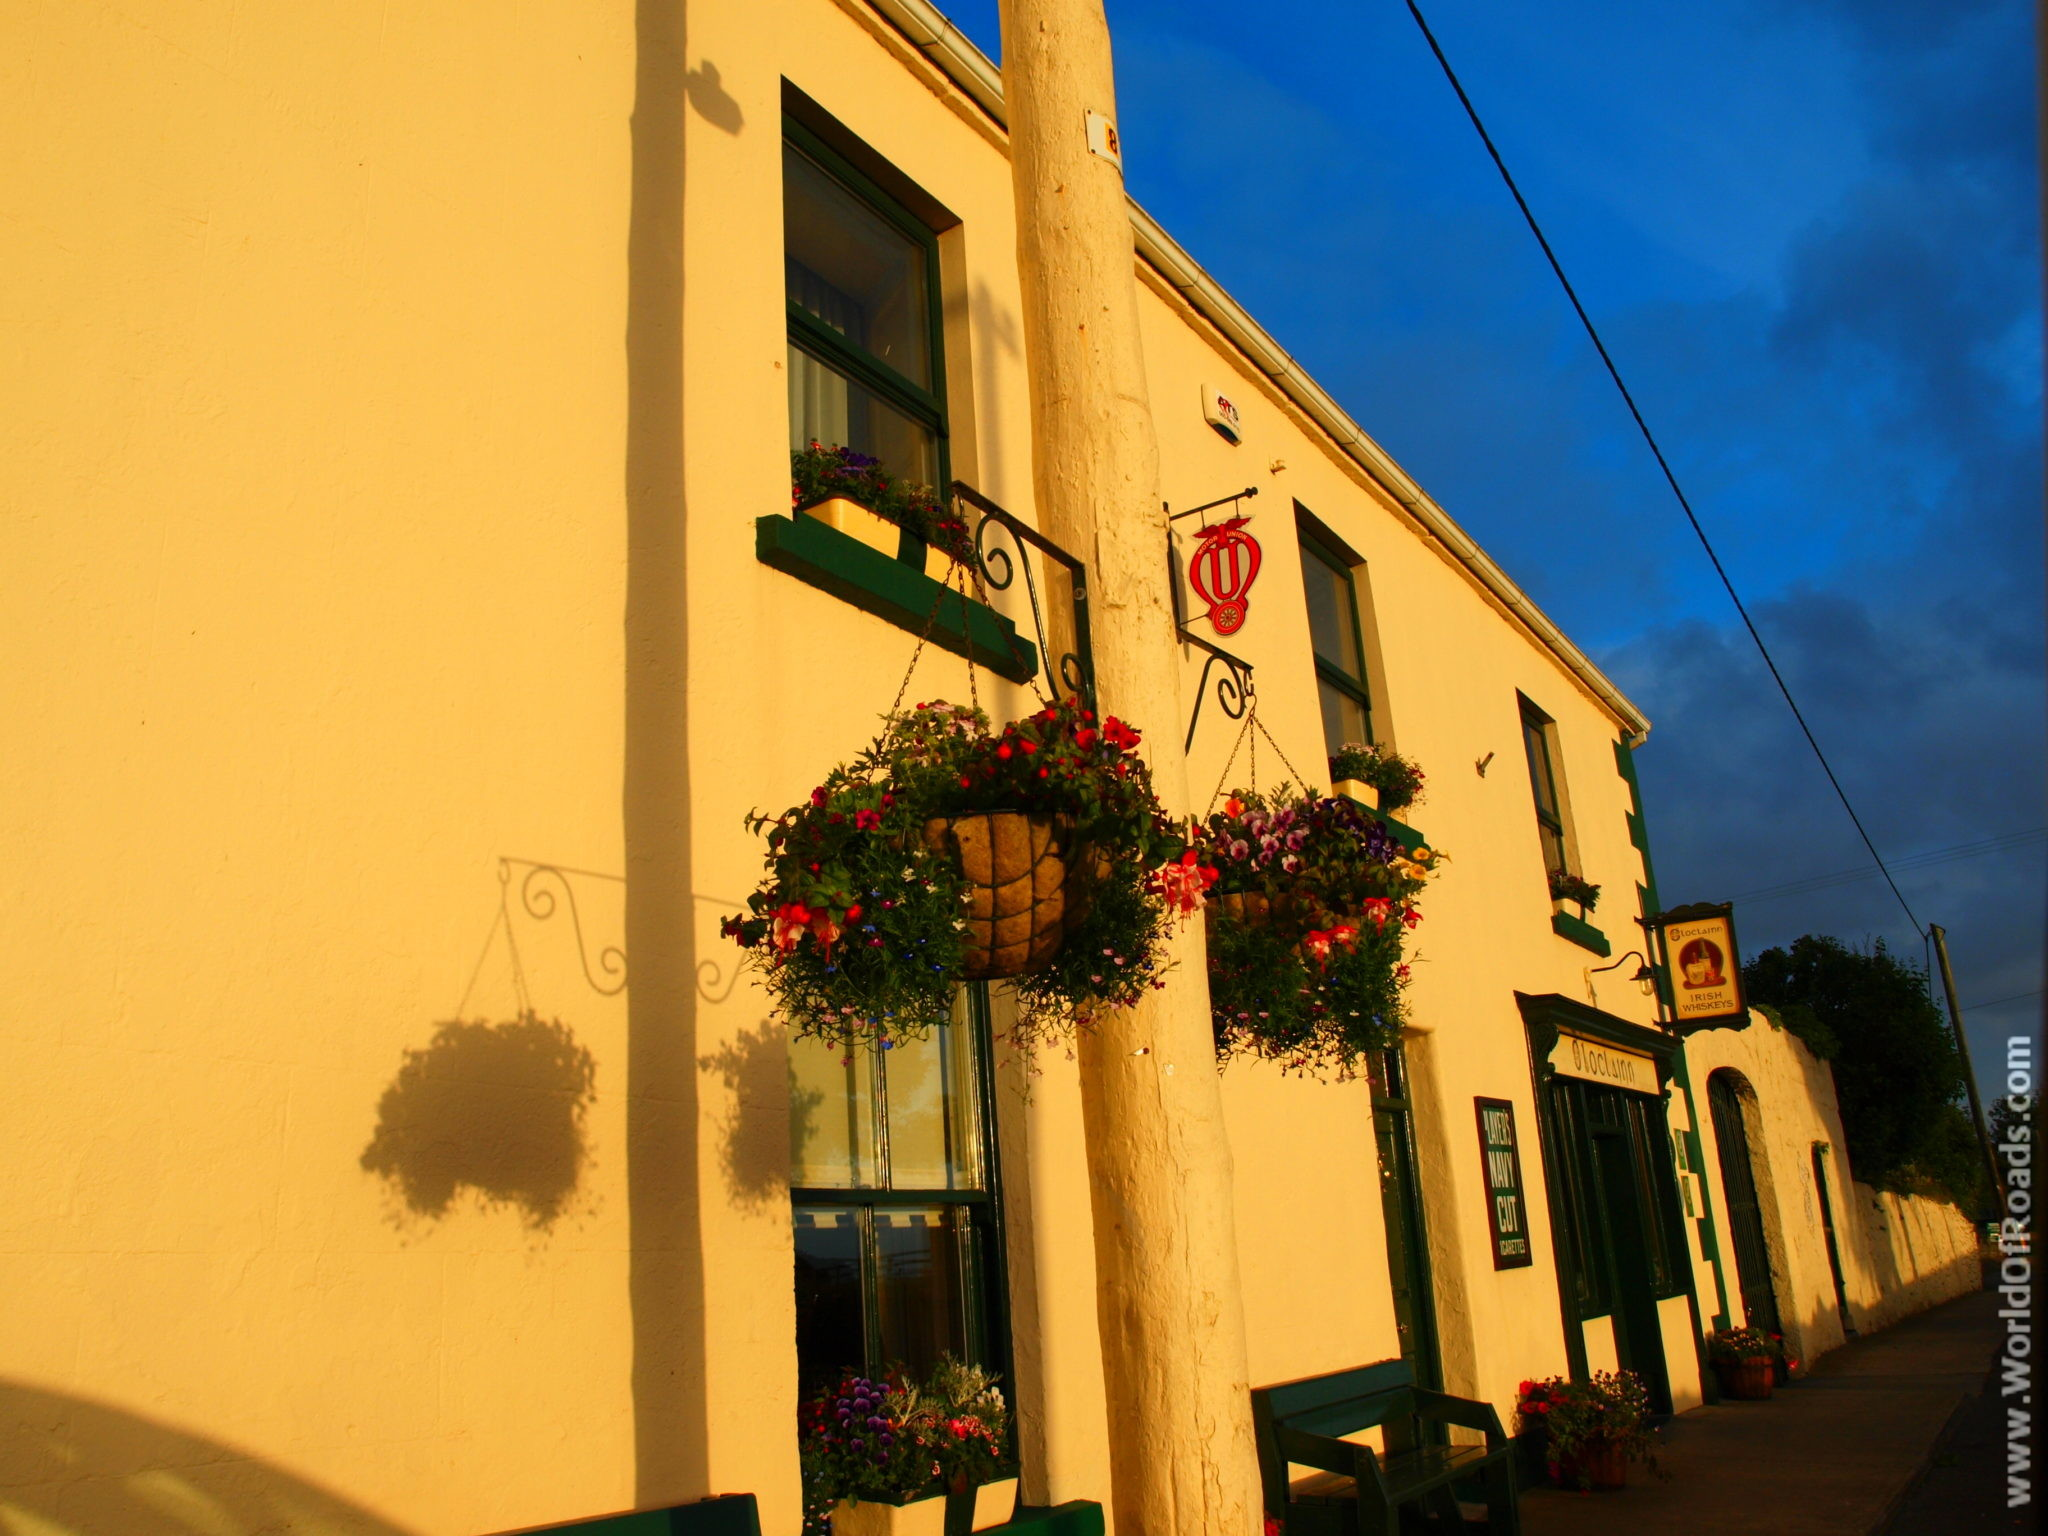 Поселок. Ирландия.